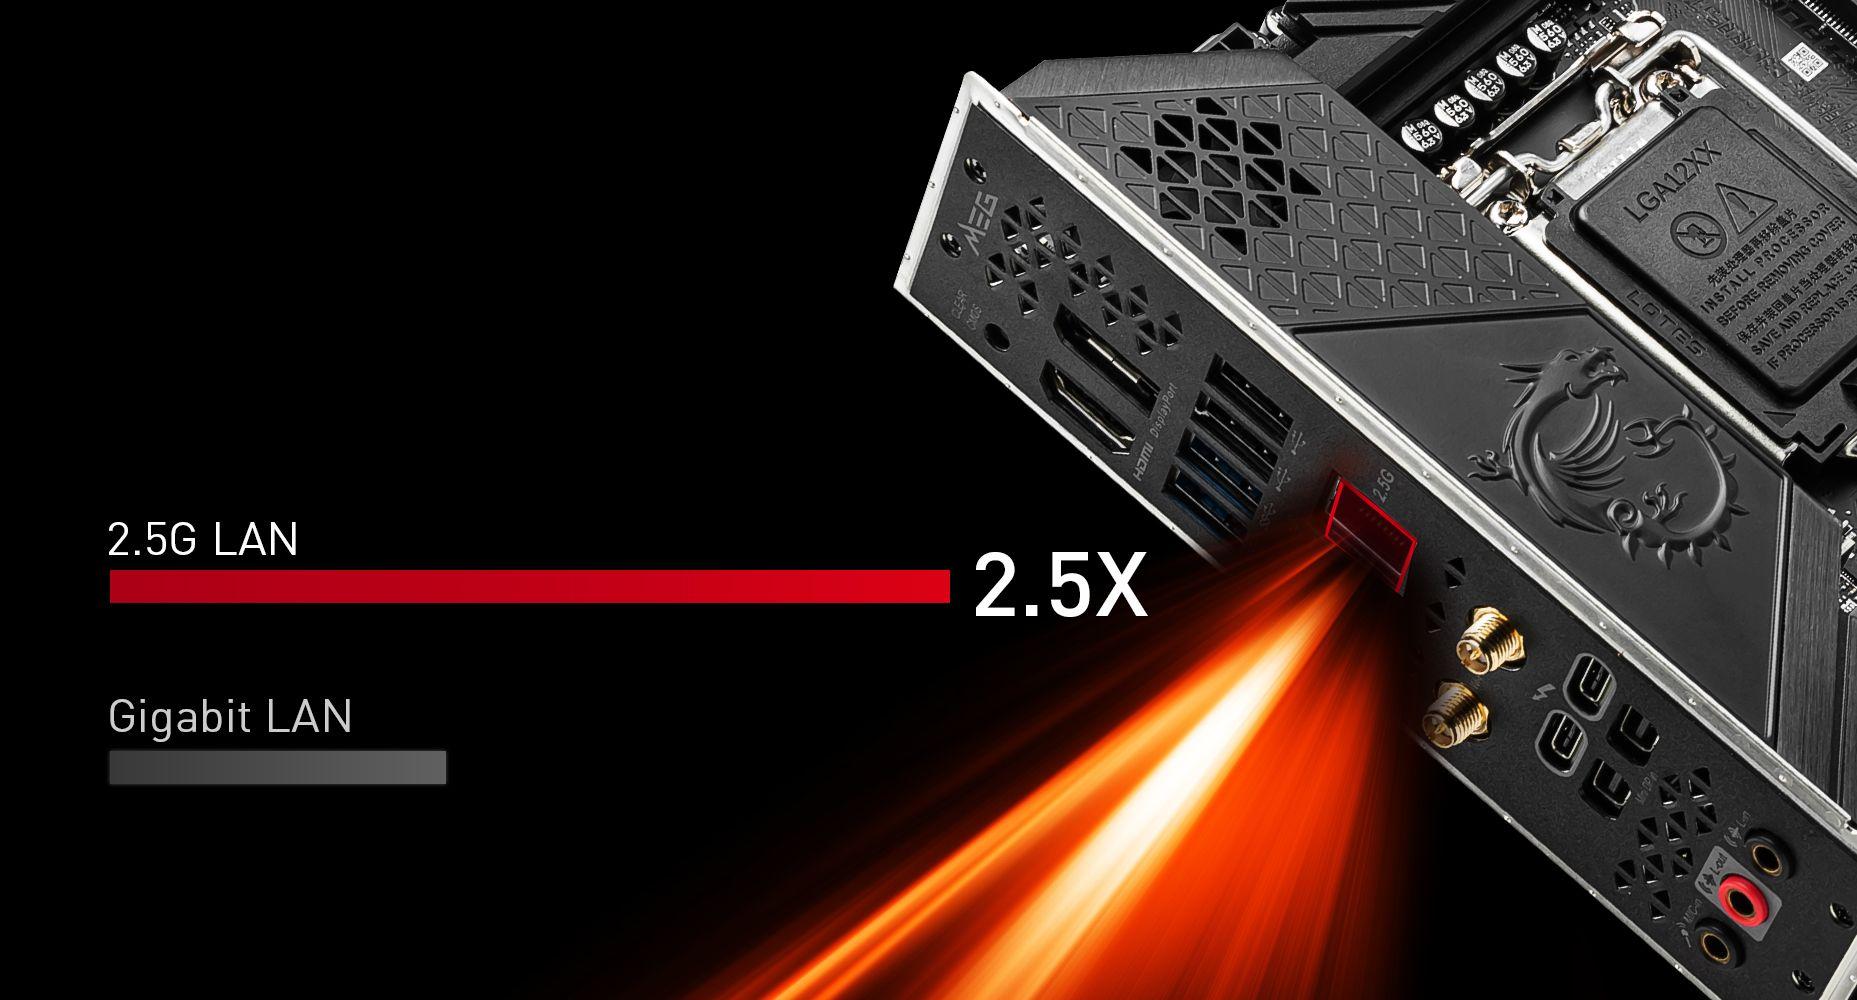 MSI MEG Z590I UNIFY MAXIMIUM DATA TRANSFER WITH 2.5G LAN